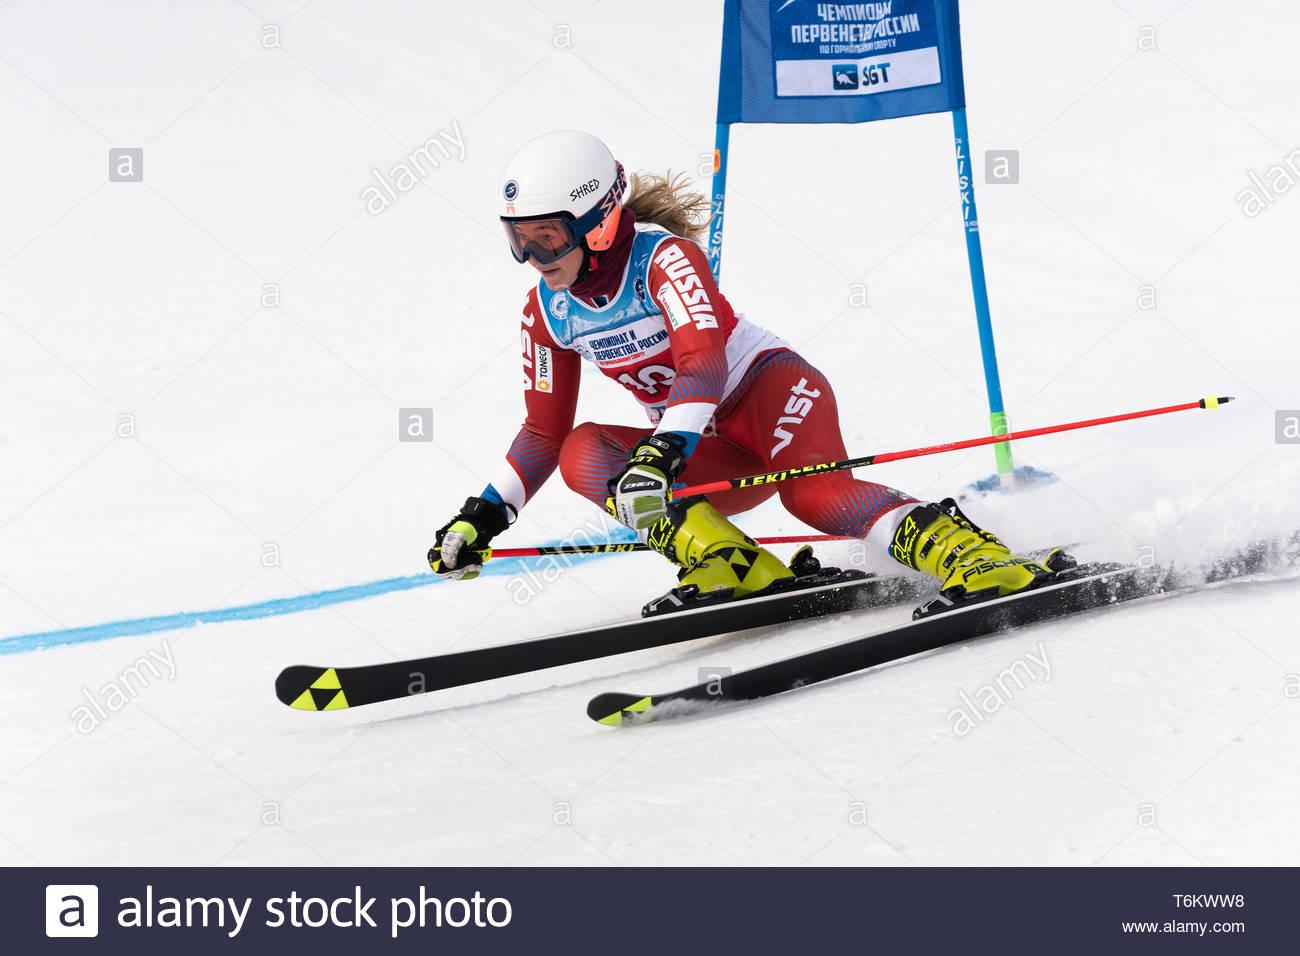 KAMCHATKA PENINSULA, RUSSIA - APR 2, 2019: Mountain skier Rinata Abdulkayumova (Kamchatka) skiing down mount. International Ski Federation, Championsh - Stock Image